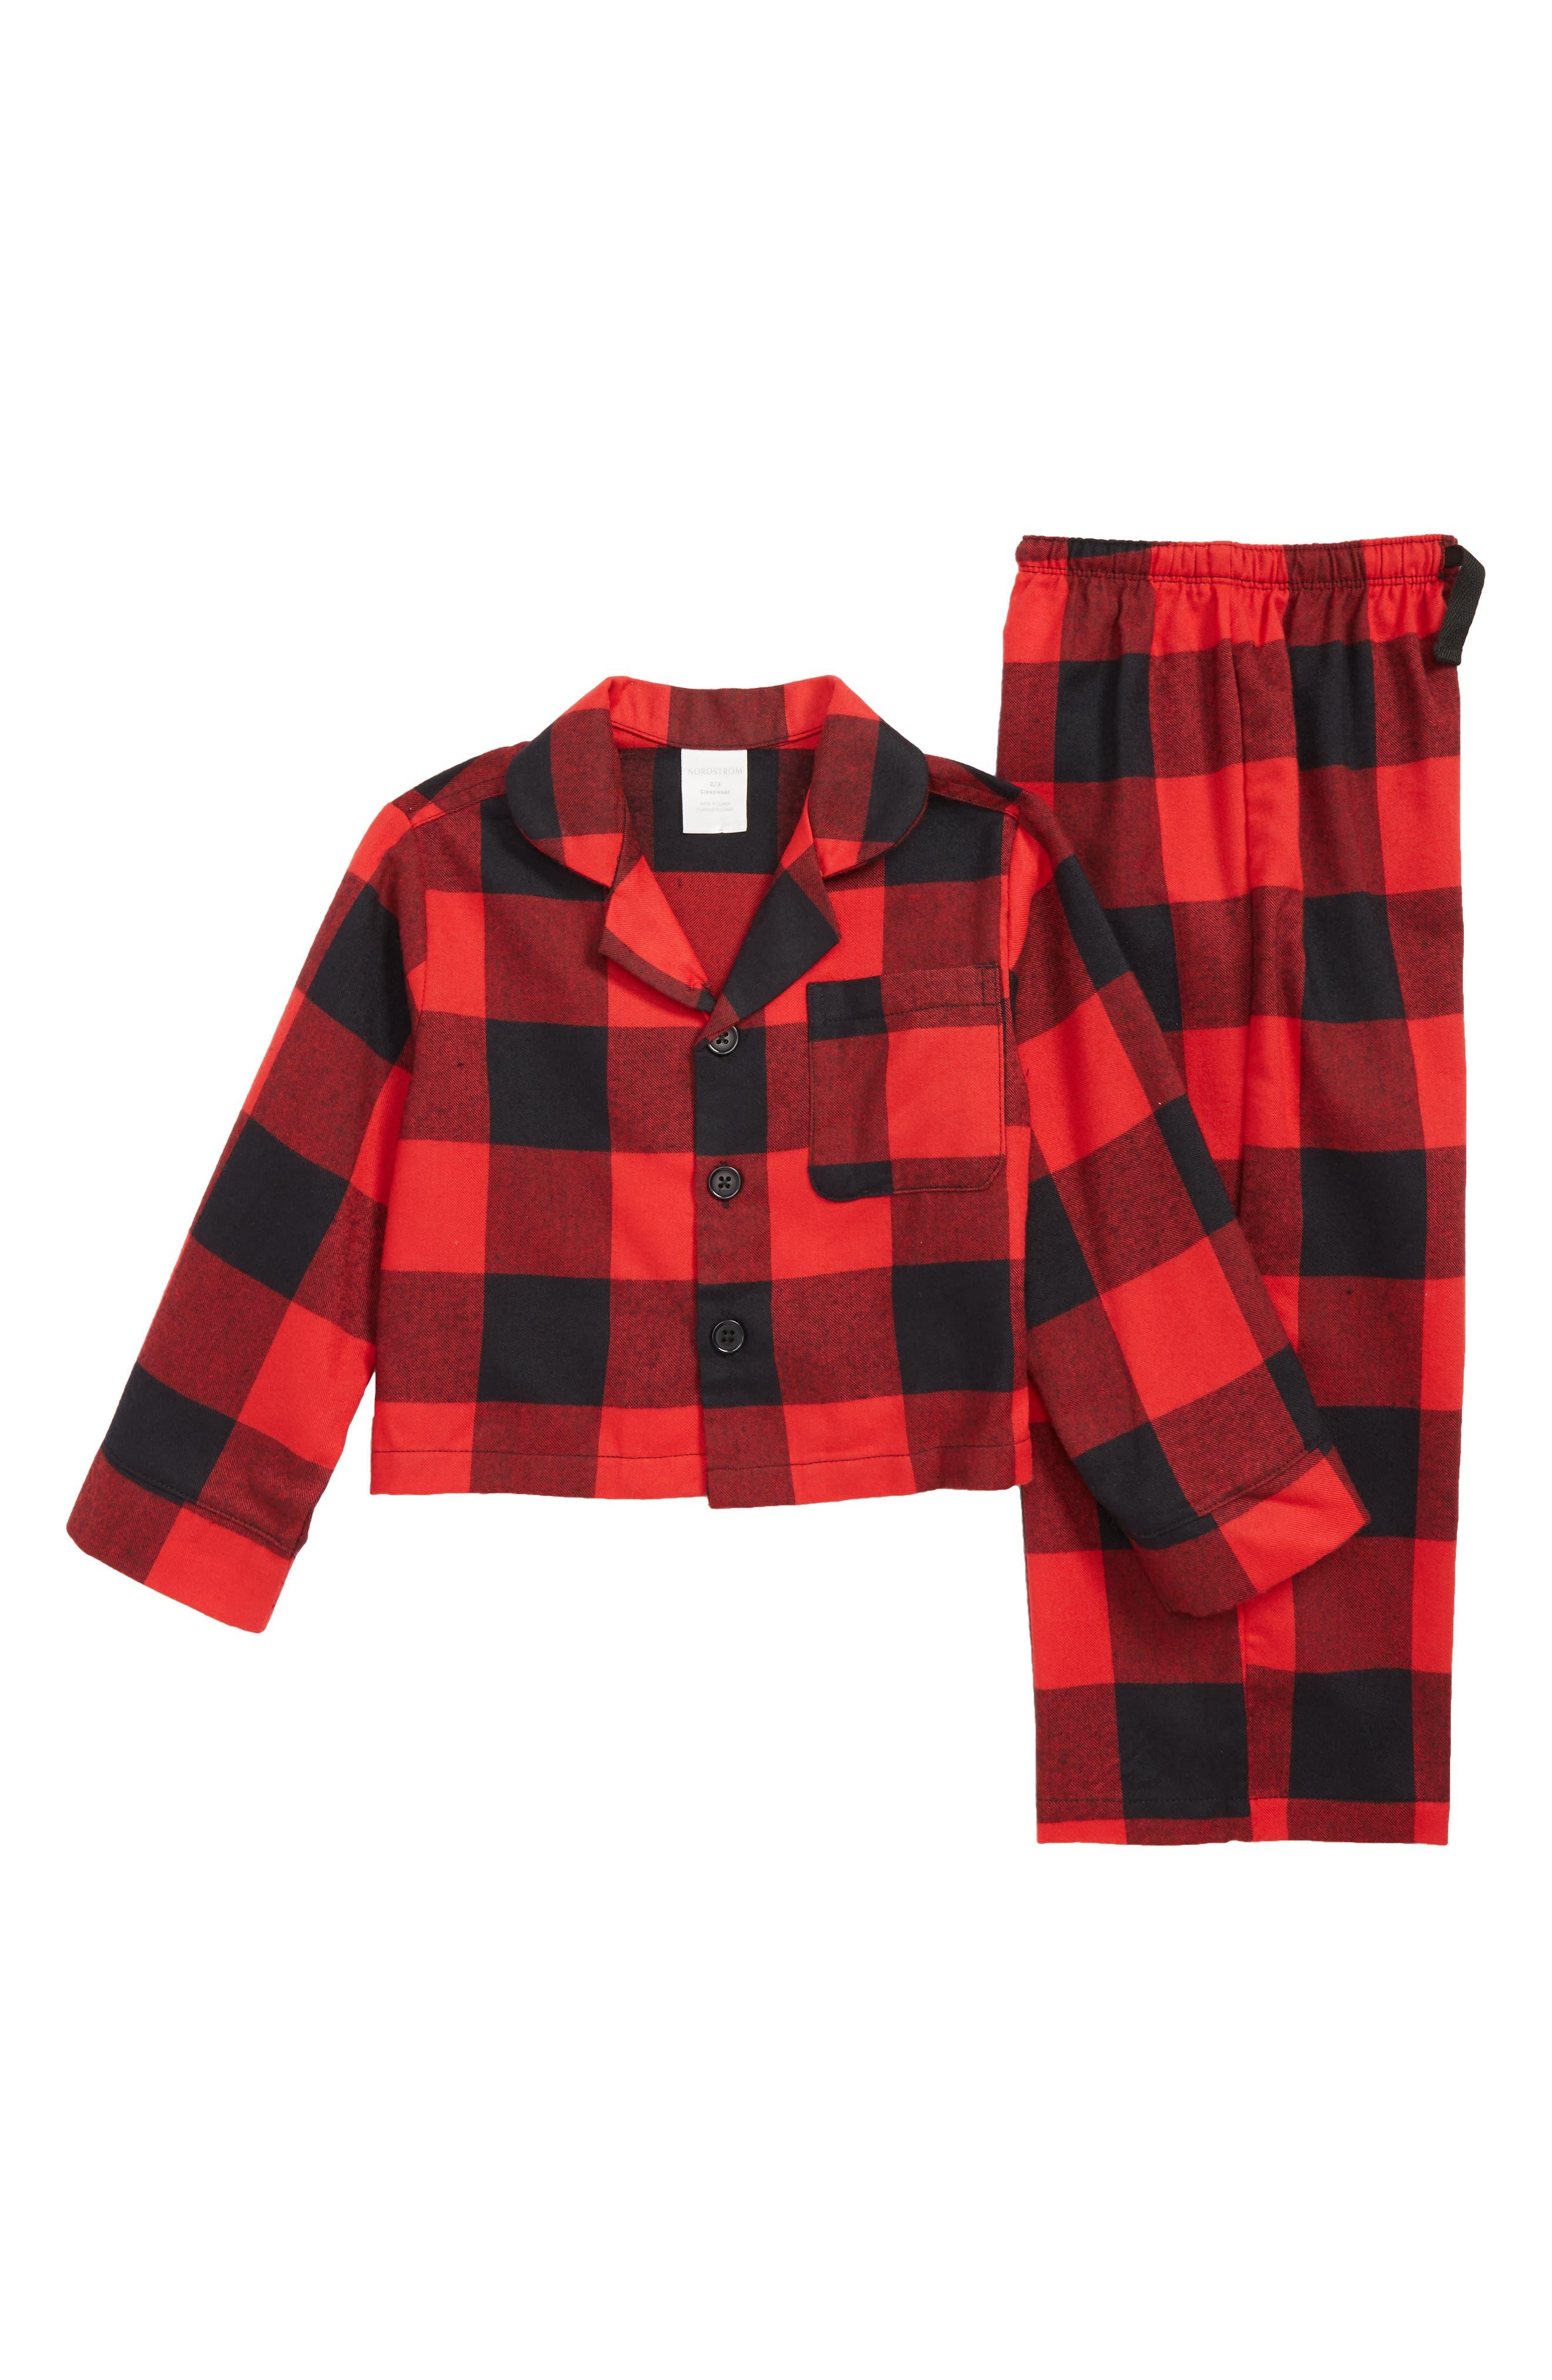 Flannel Pajamas,                             Main thumbnail 1, color,                             RED BLOOM LARGE BUFFALO CHECK